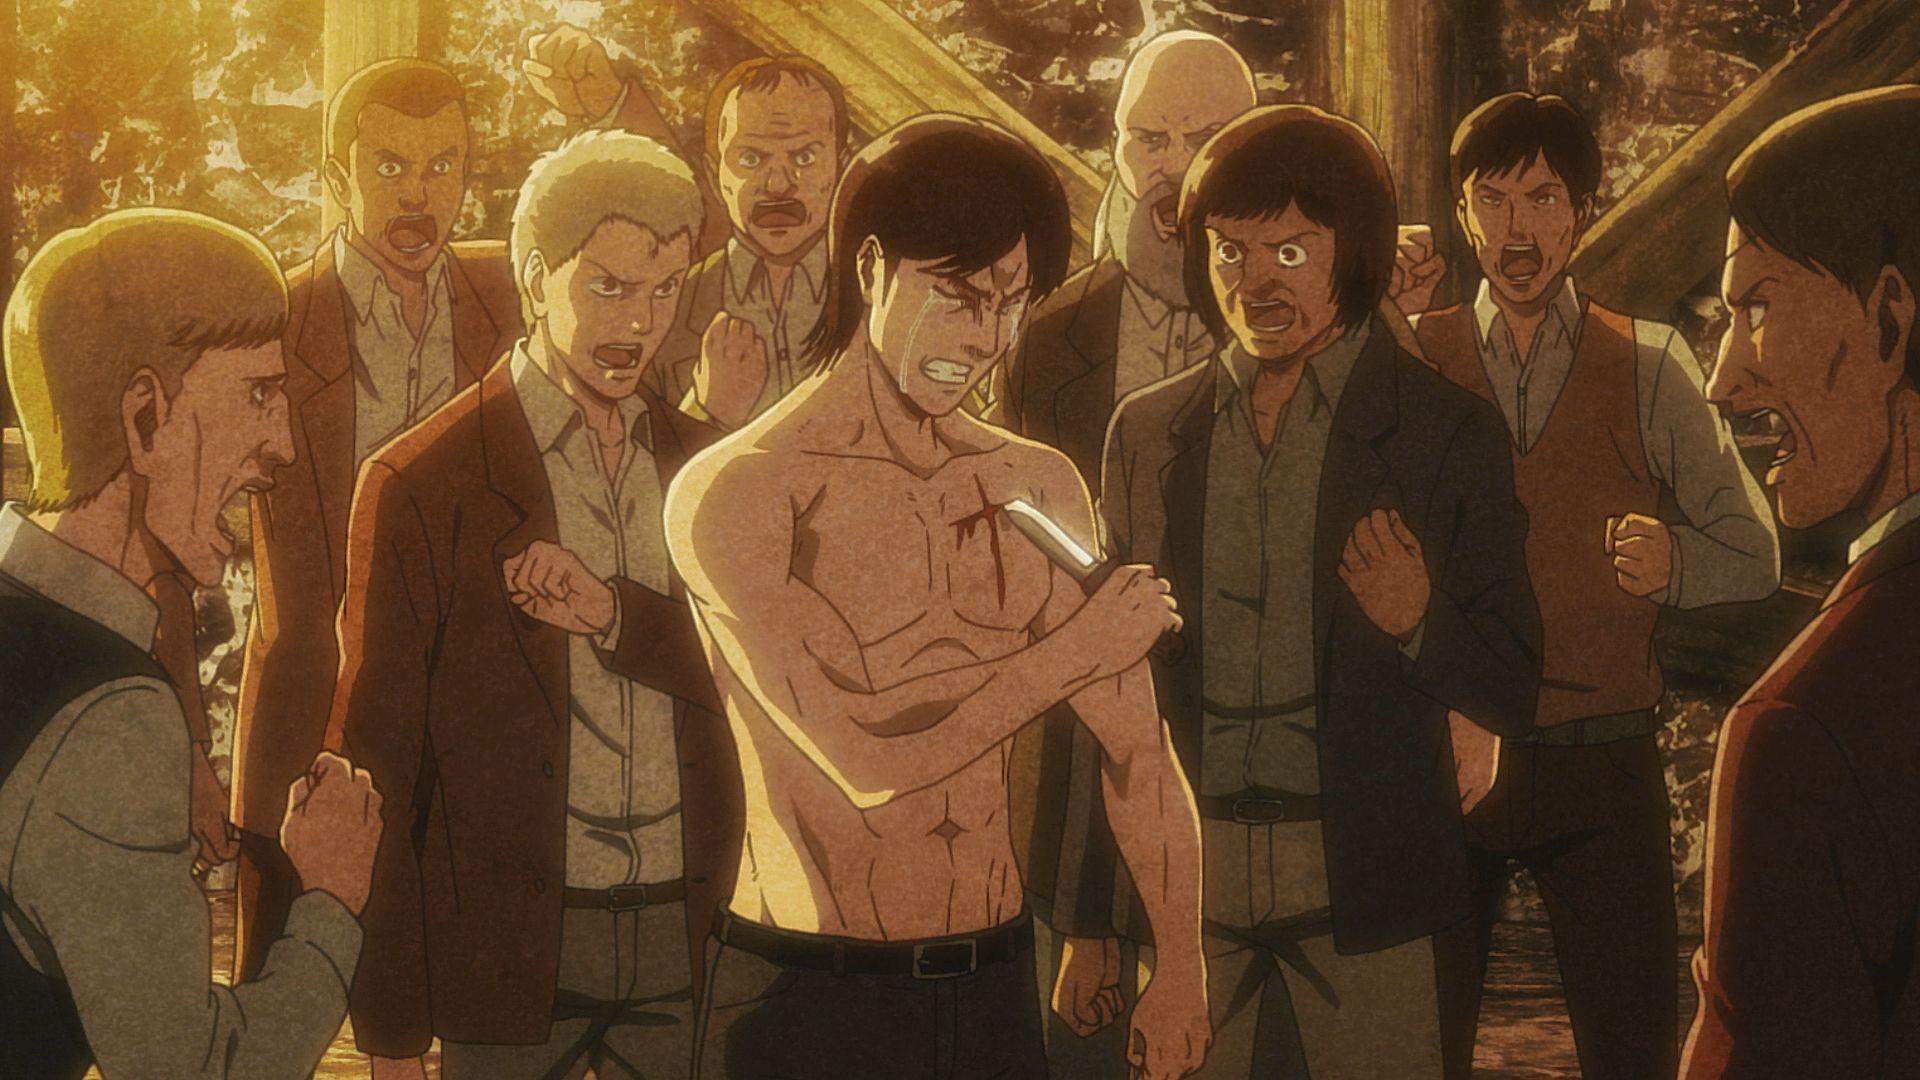 Attack On Titan Manga Jepang Prasangka Dan Isu Kelompok Halaman All Kompasiana Com